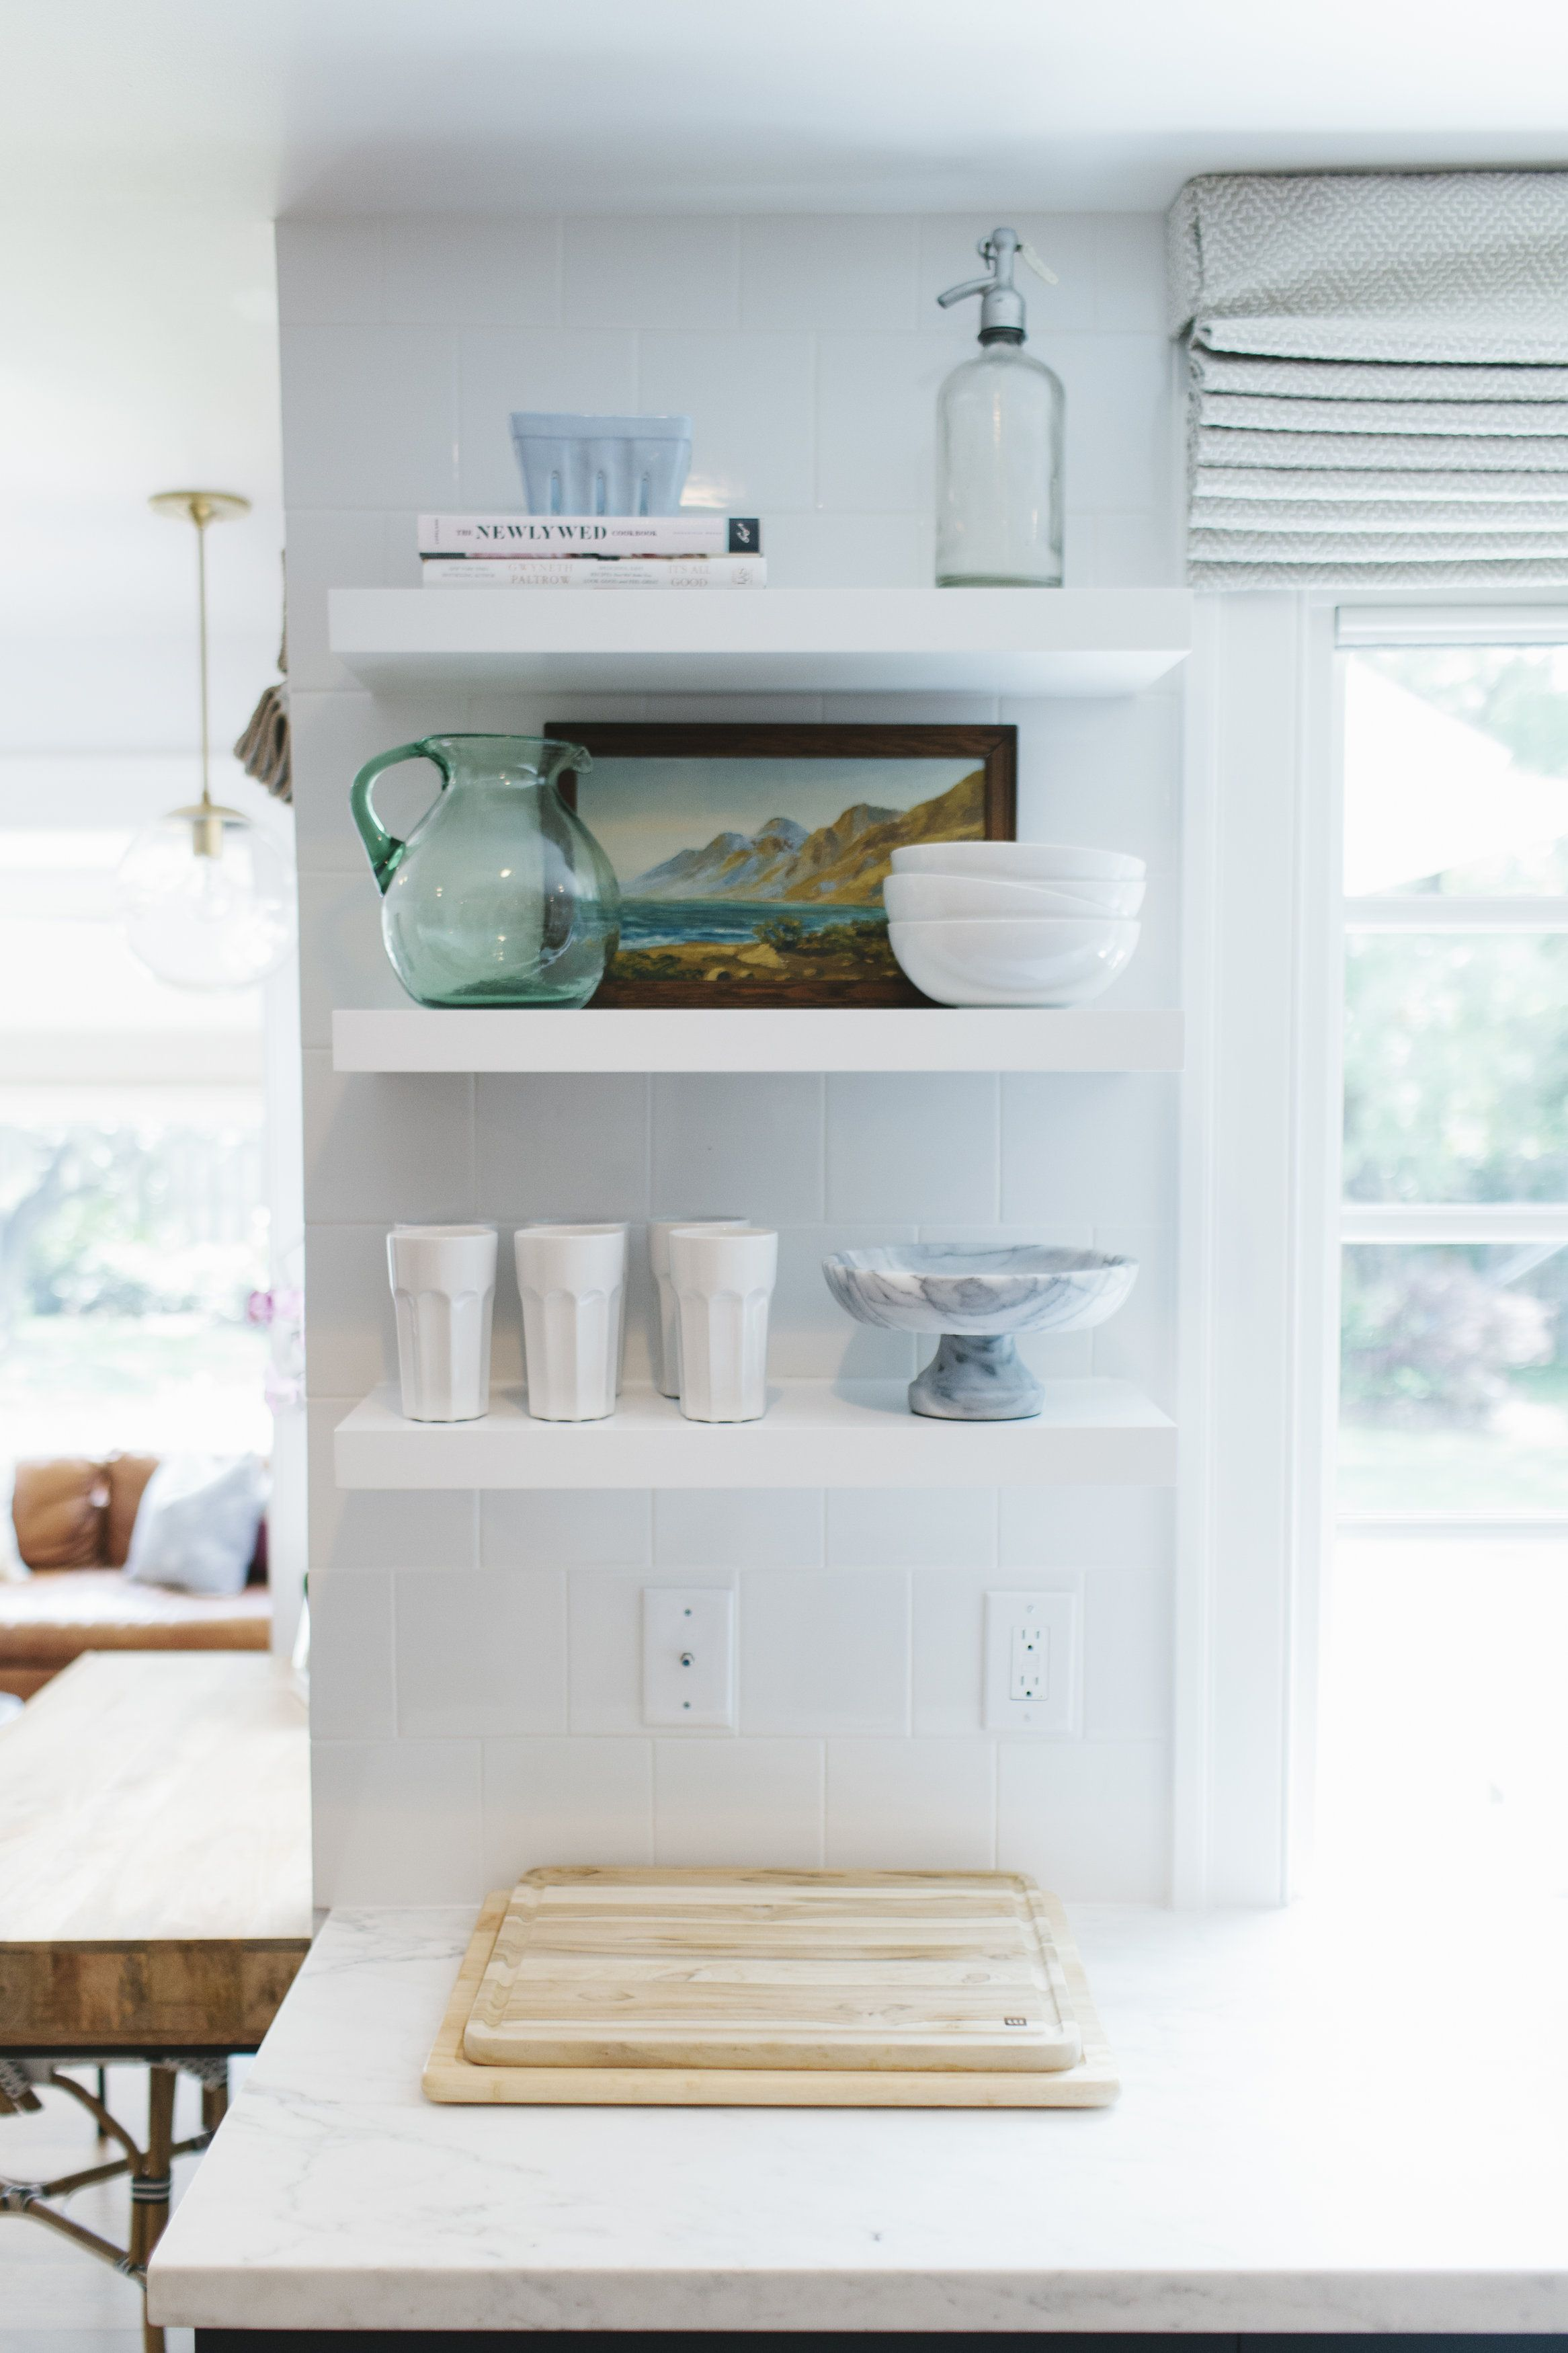 Lynwood Remodel: Kitchen | L I V I N G | Pinterest | Studio mcgee ...